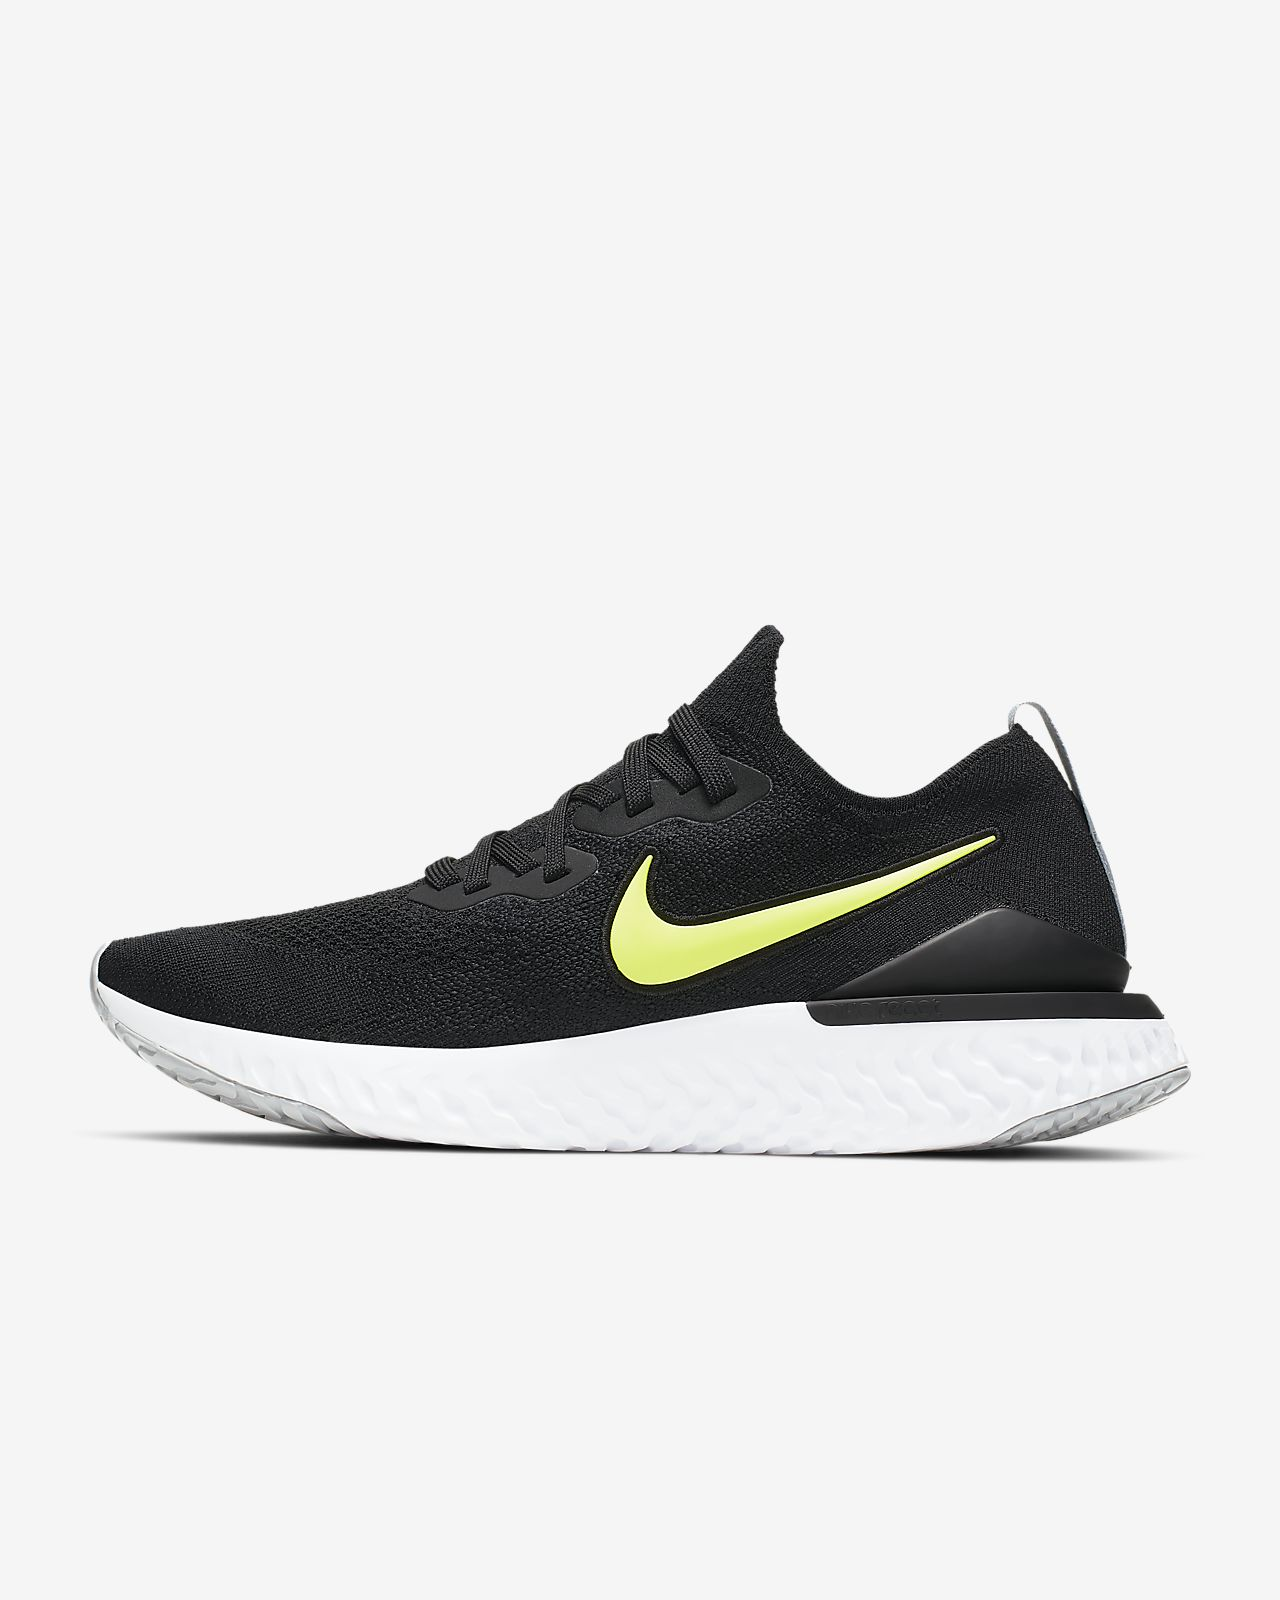 3848b7d0545 Calzado de running para hombre Nike Epic React Flyknit 2. Nike.com MX